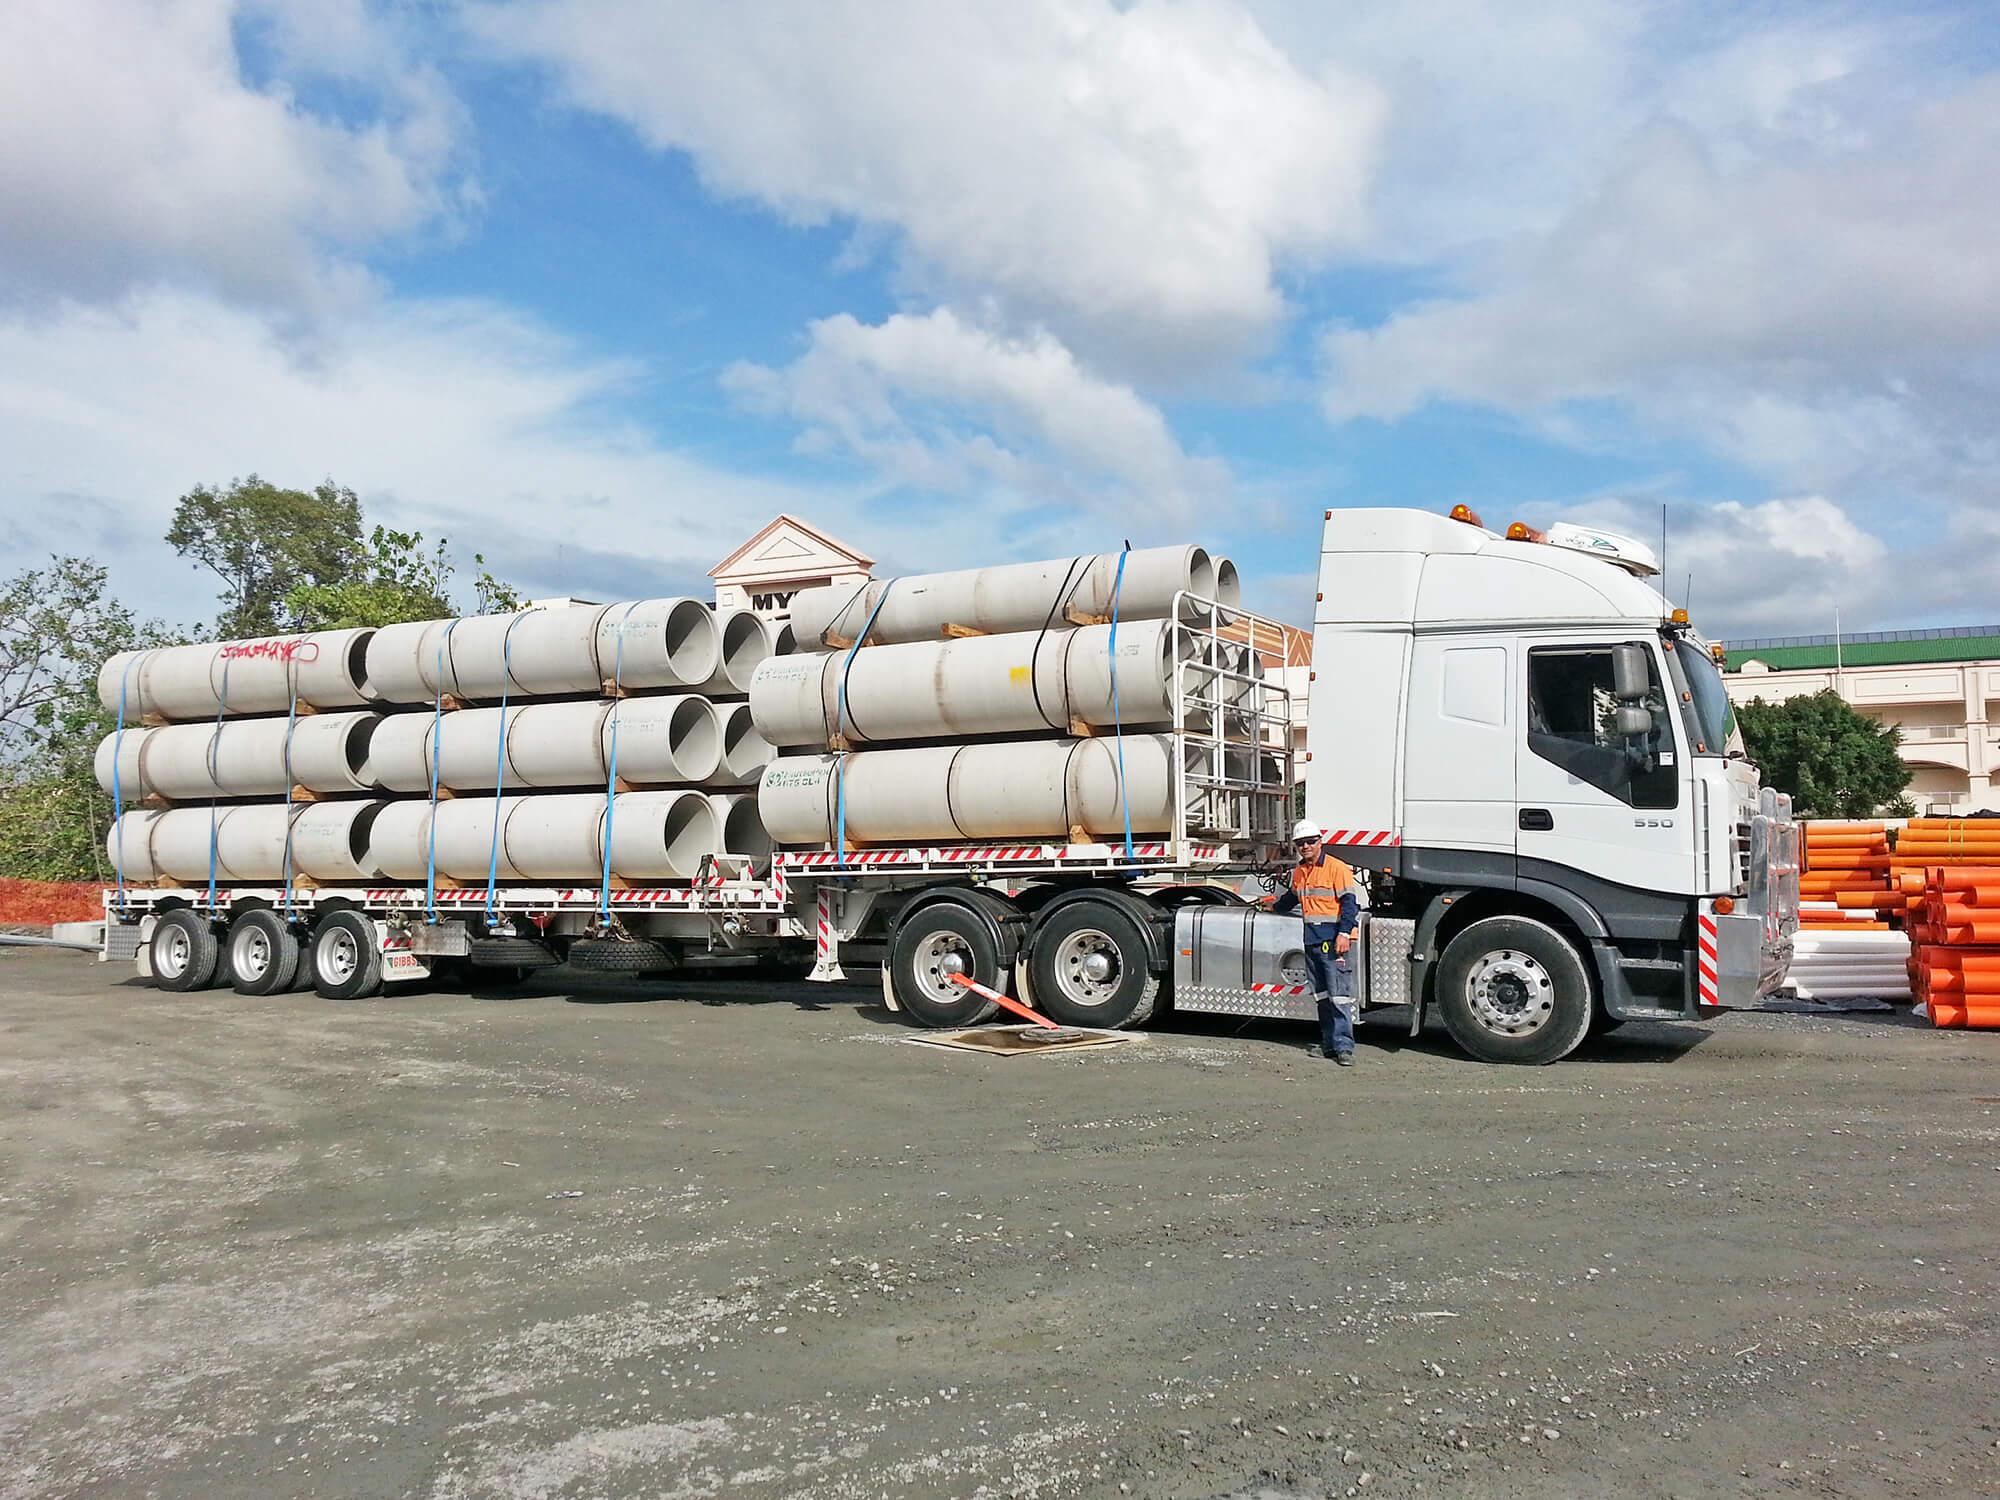 goldcoastcranehire-salazar-crane-truck Brisbane